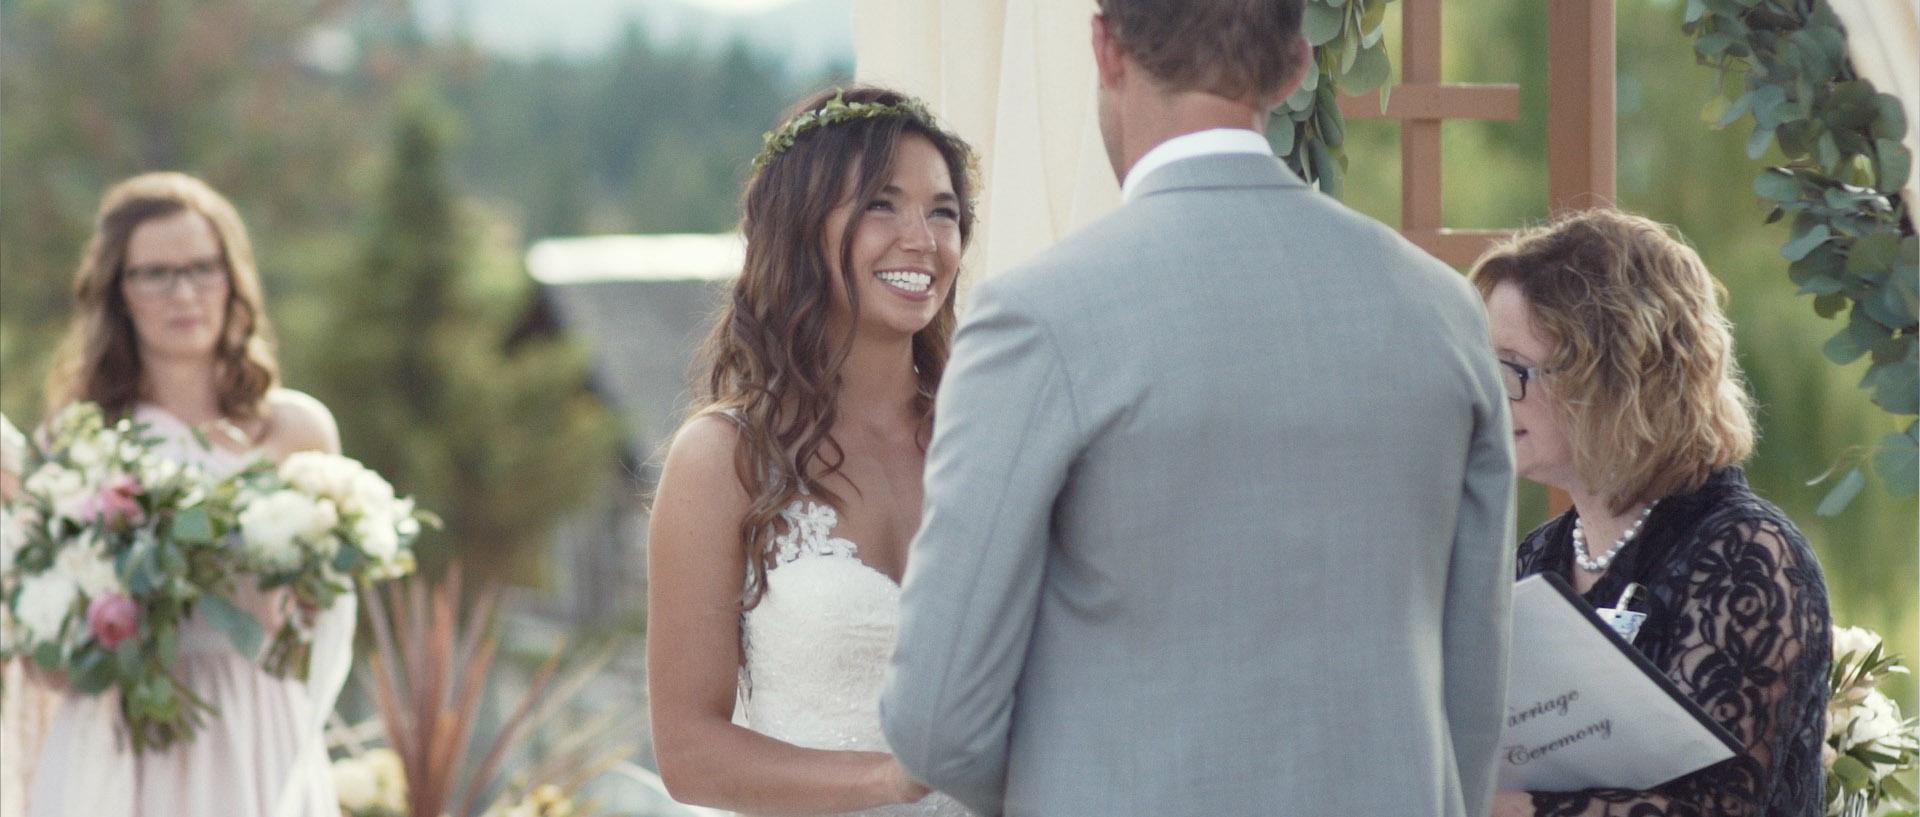 write your own wedding vows